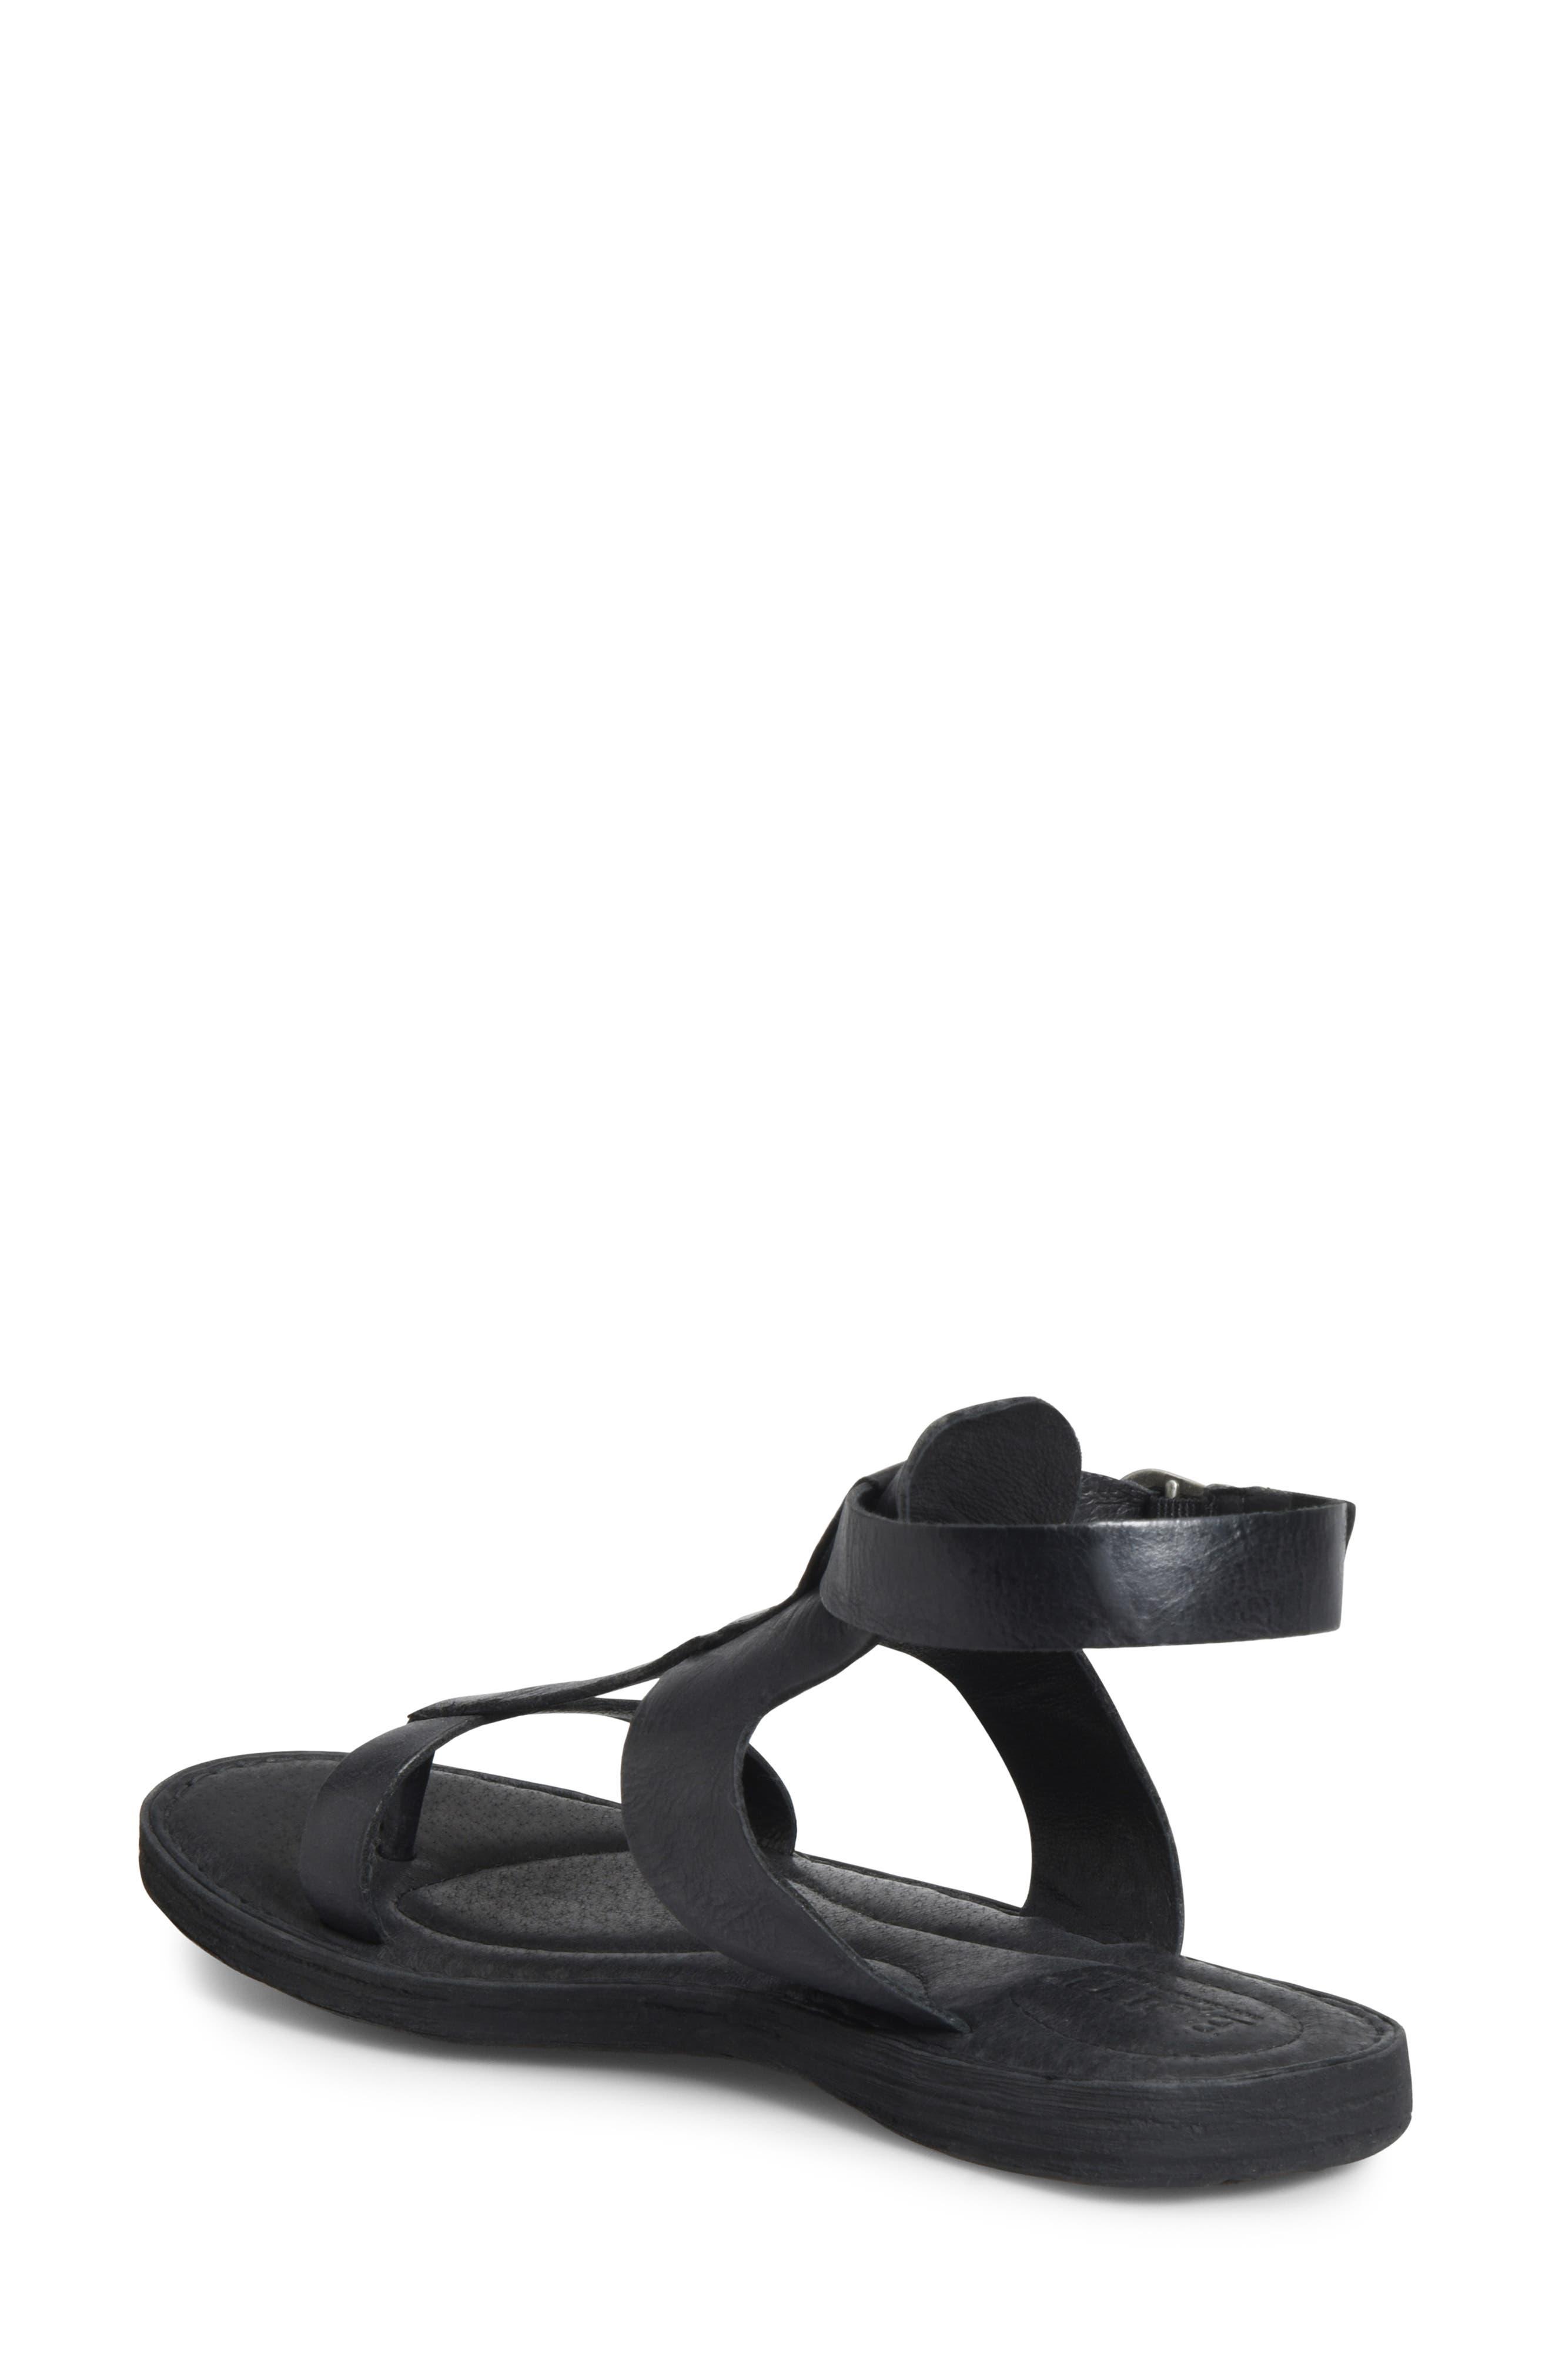 076df4681 Women s Børn Sandals